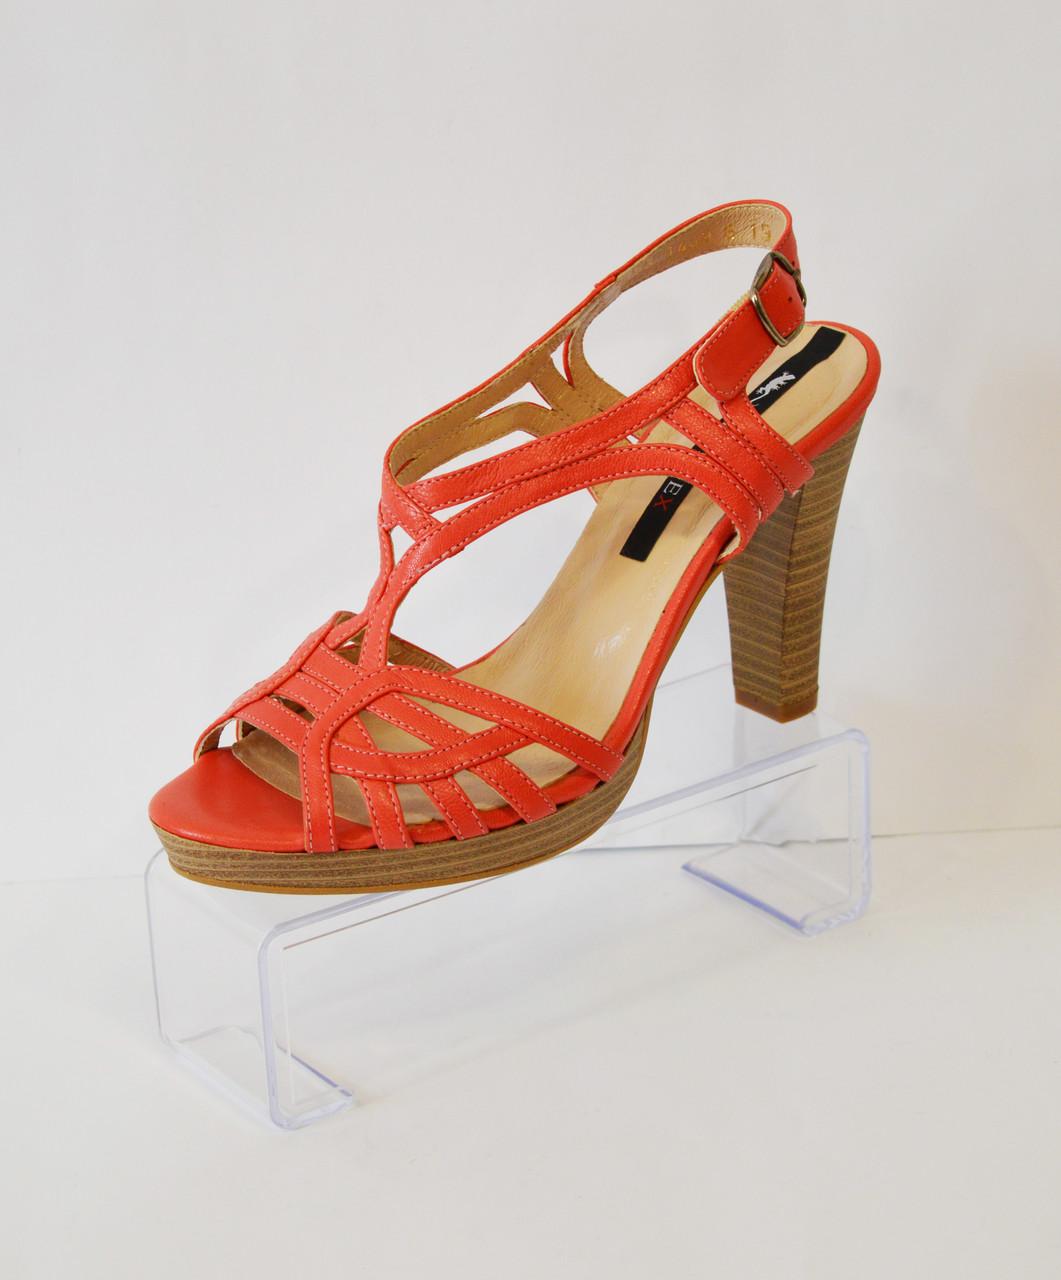 Оранжевые босоножки на каблуке Ann-mex 3953